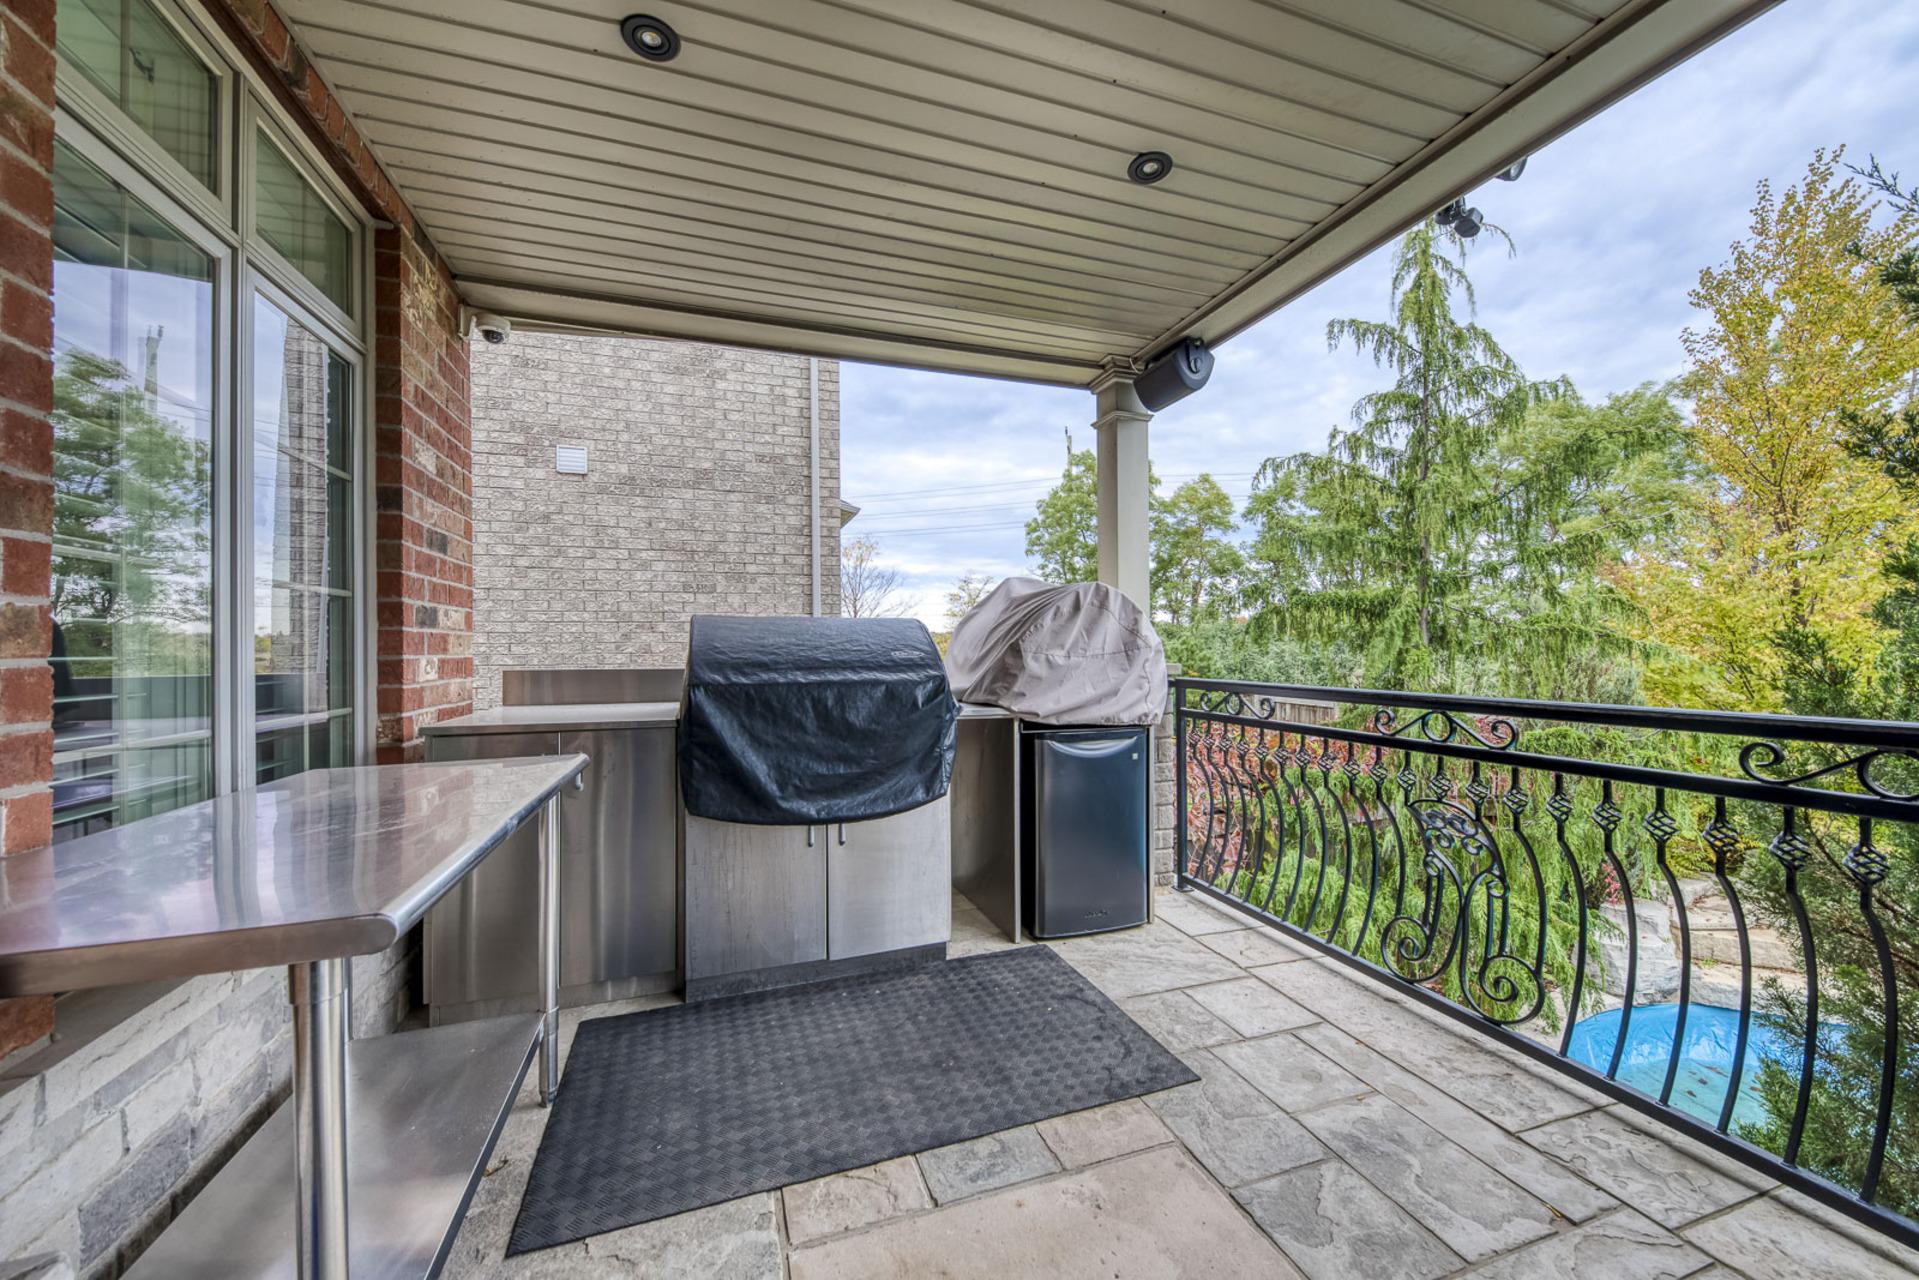 Backyard Deck - 2415 Lyndhurst Dr, Oakville - Elite3 & Team at 2415 Lyndhurst Drive, Iroquois Ridge North, Oakville